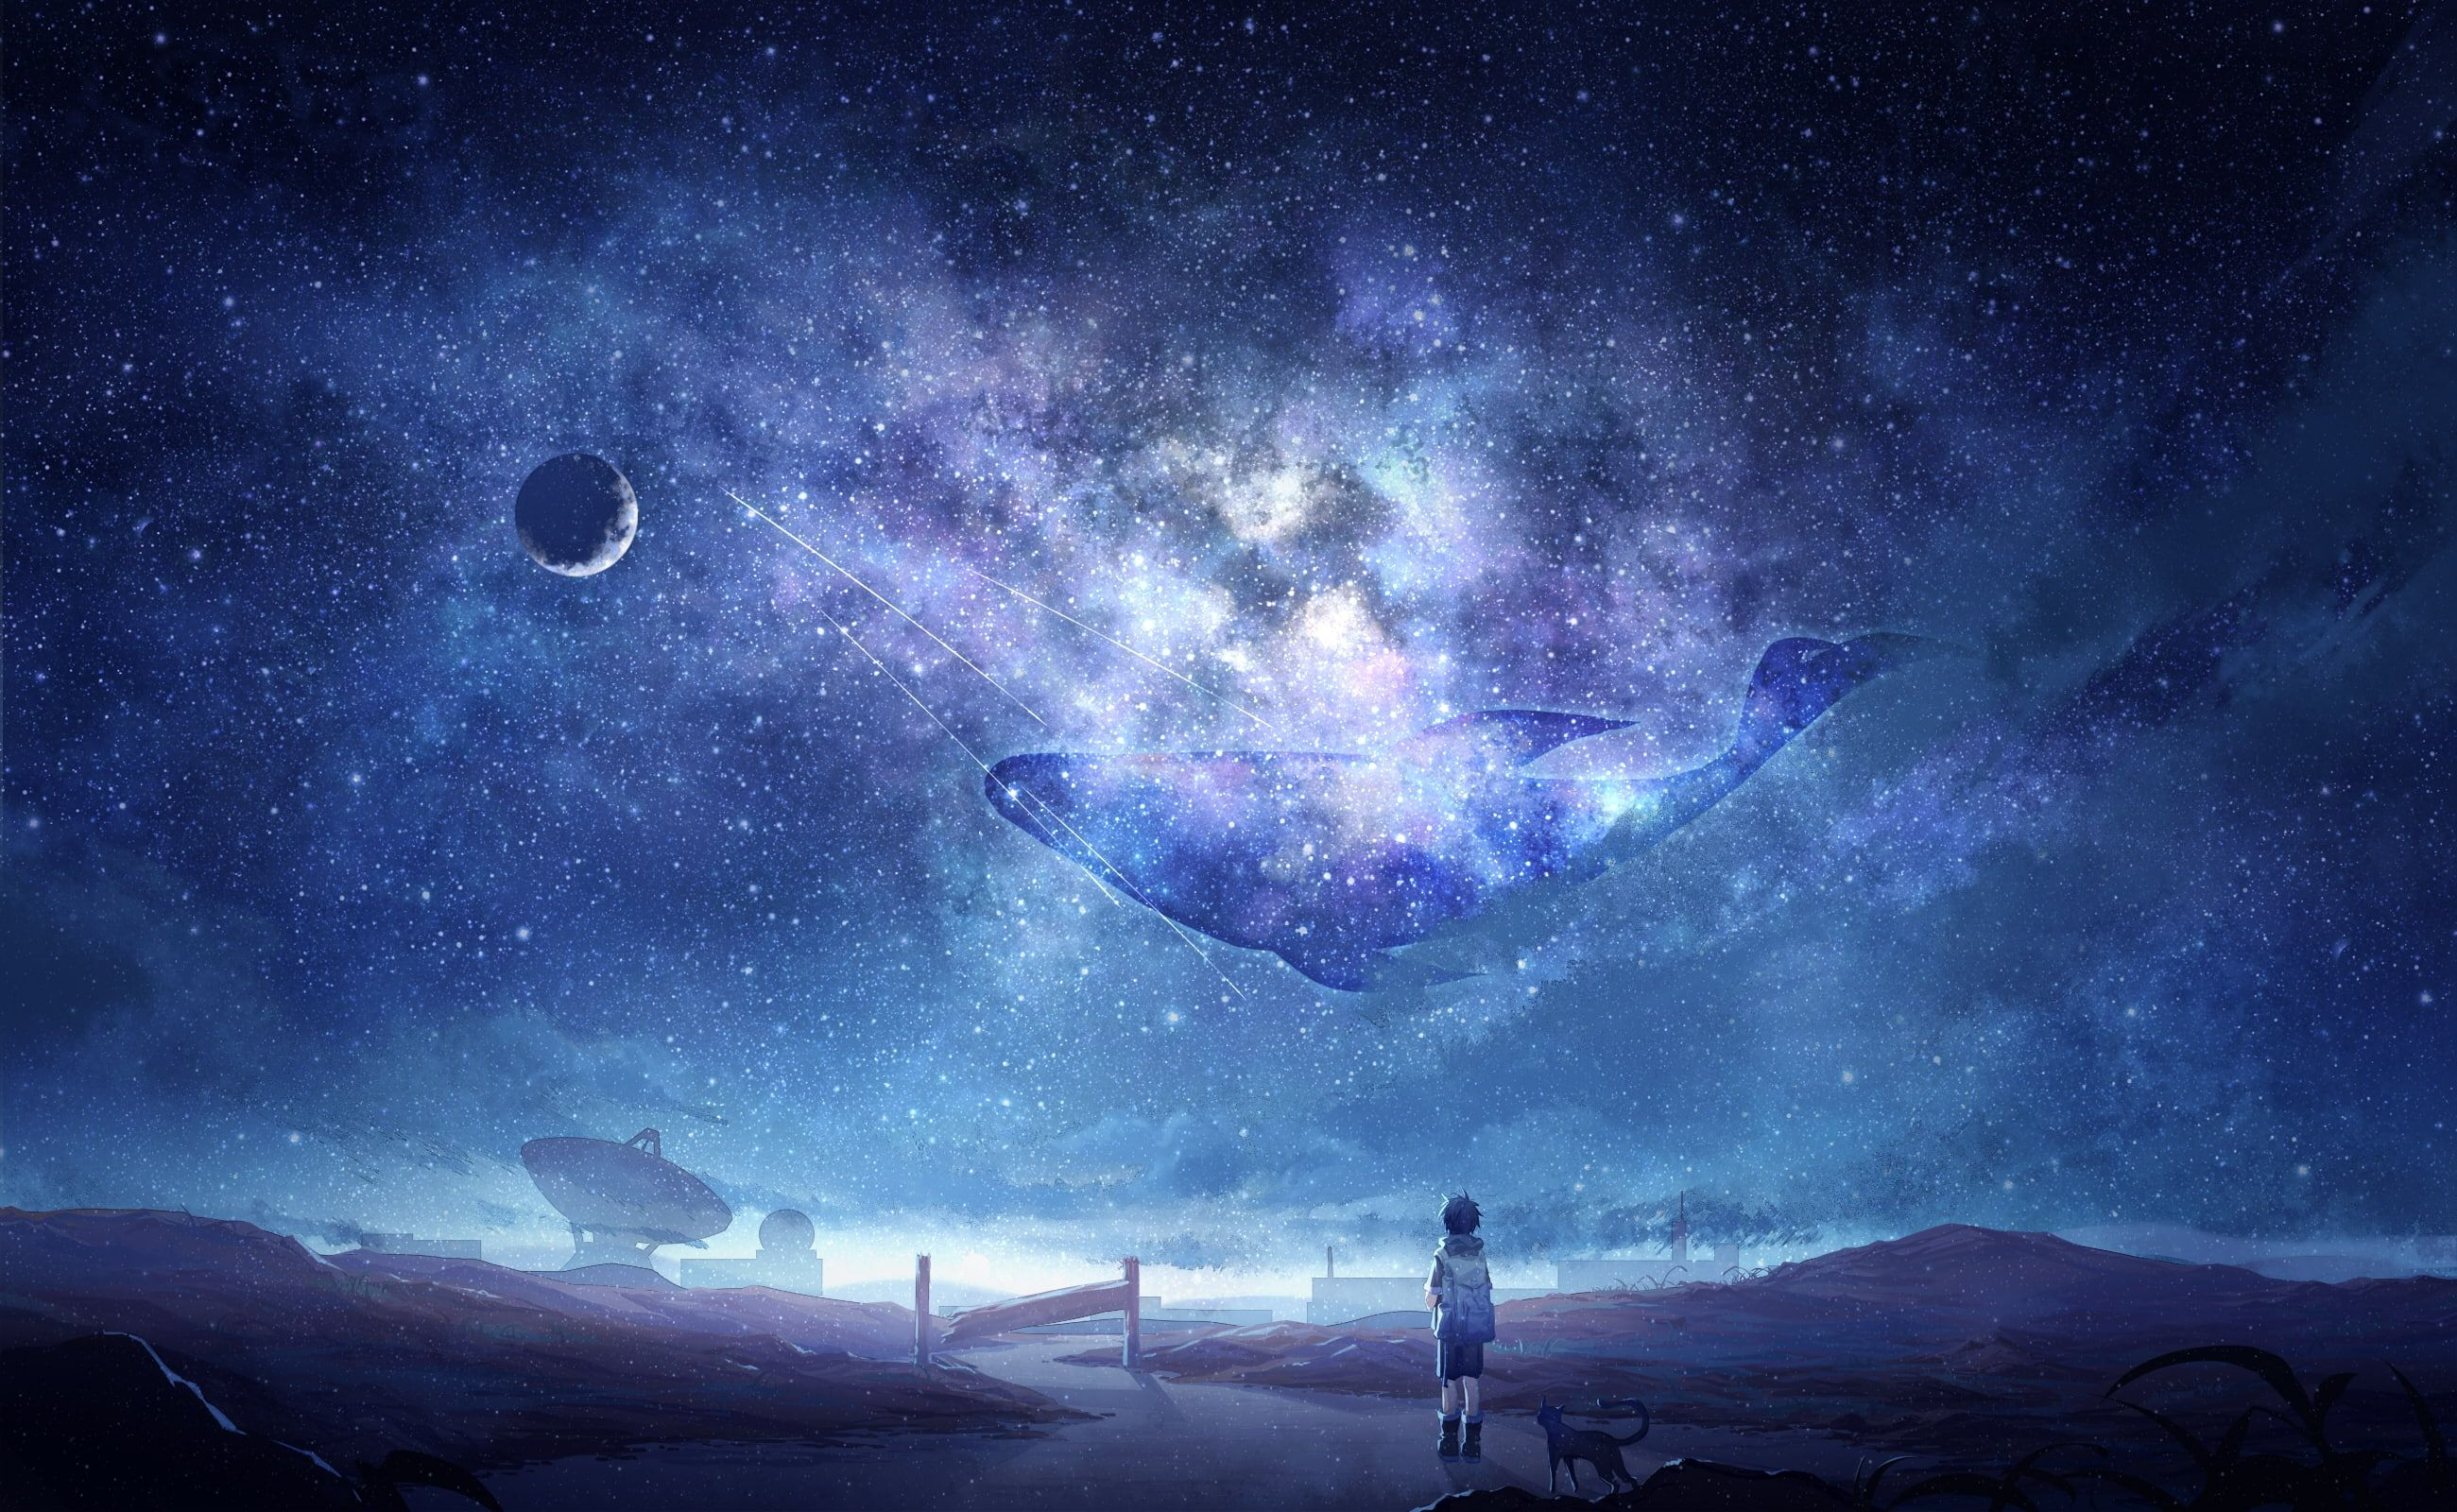 Anime Sky Milky Way Stars Anime Boy Dog Moon Whale Galaxy Anime 2k Wallpaper Hdwallpaper Desktop Anime Scenery Anime Galaxy Sky Anime